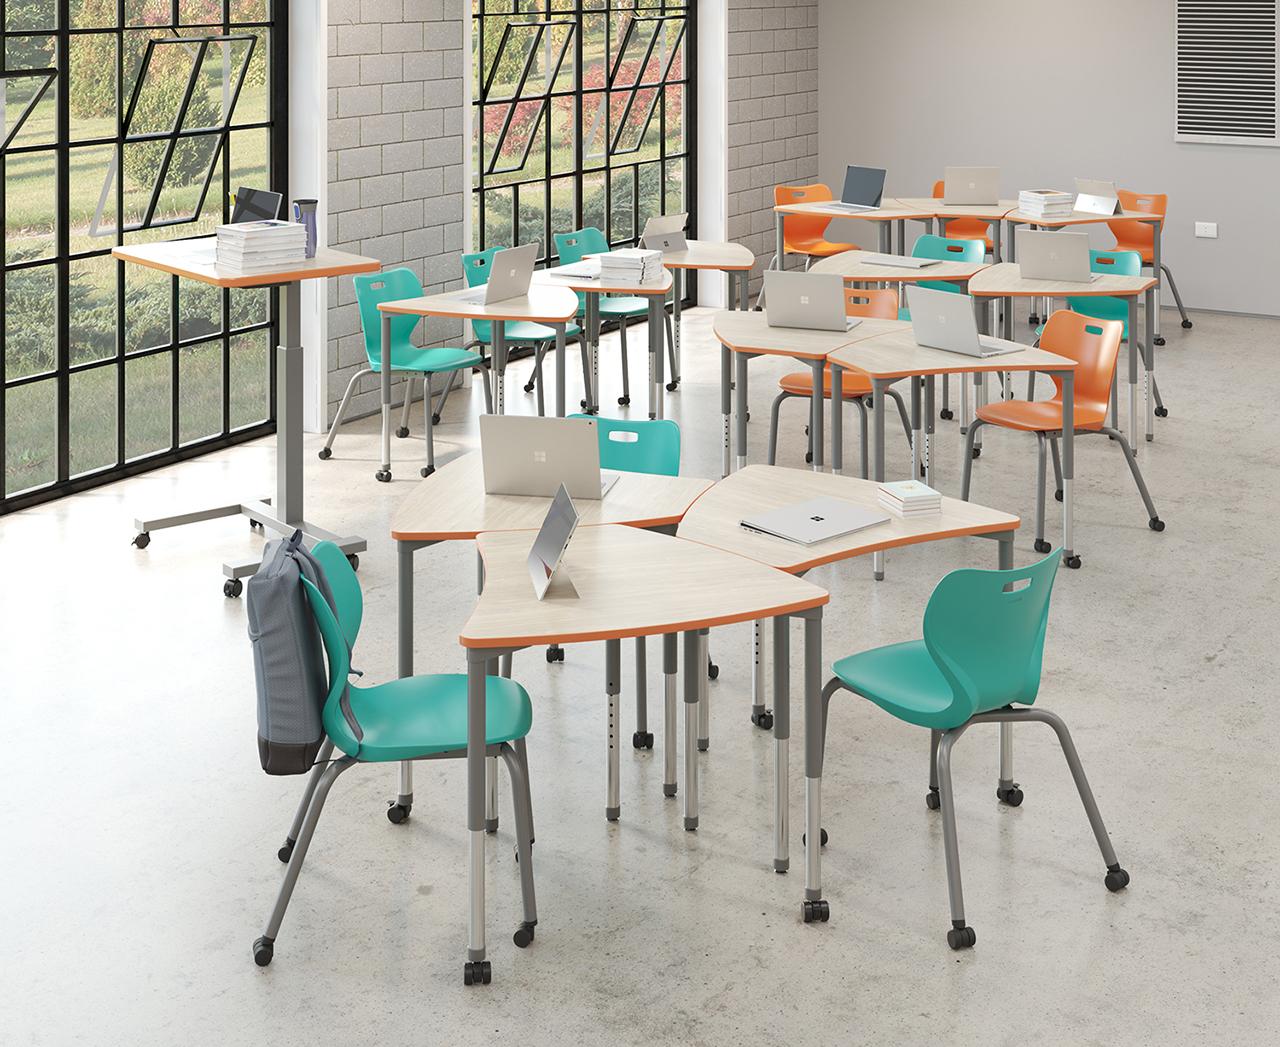 artcobell_classroom5_endless